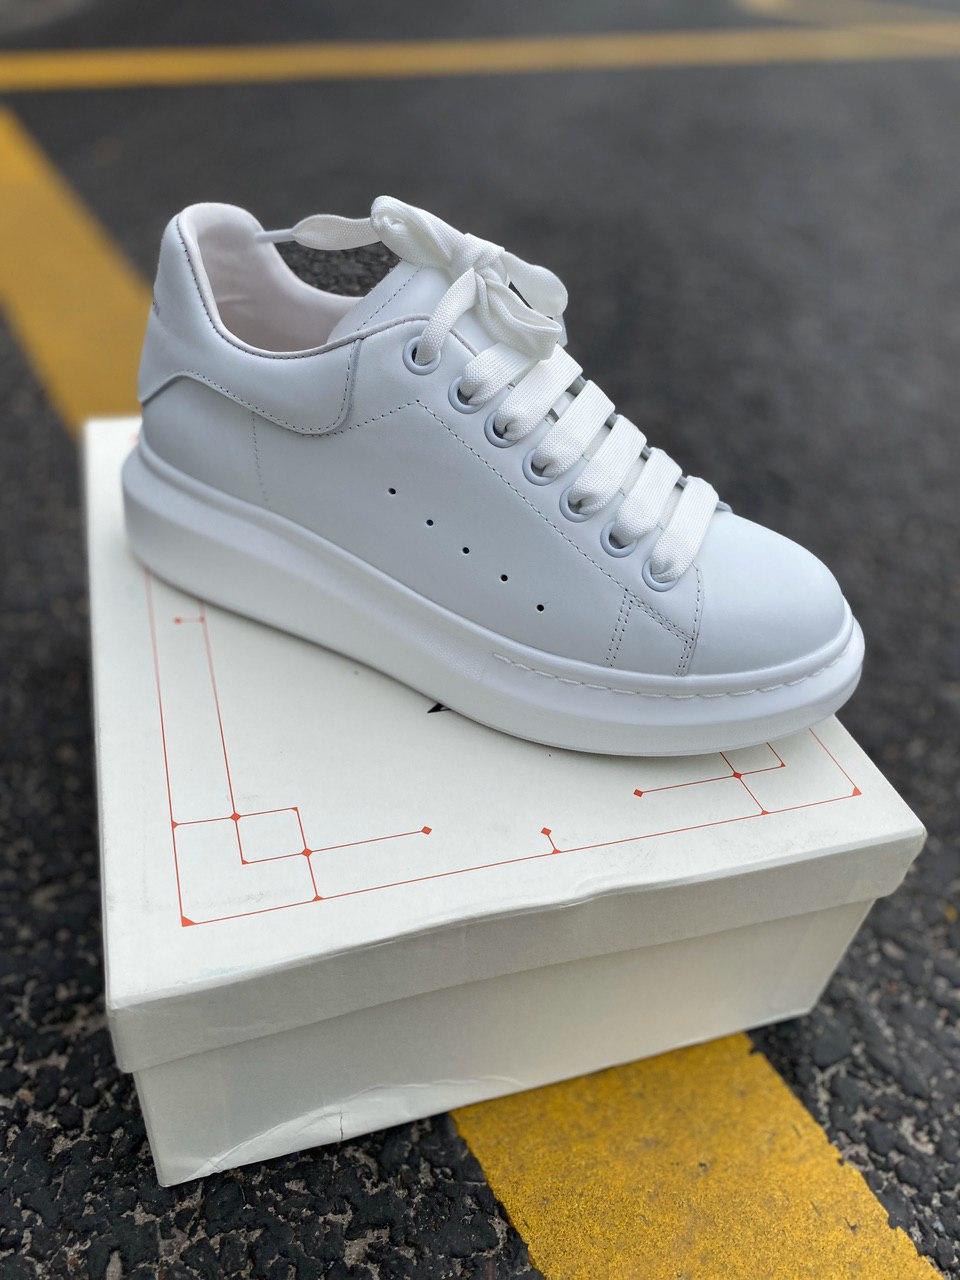 Стильны кроссовки Alexander McQueen White LUX QUALITY (Александр Маквин)